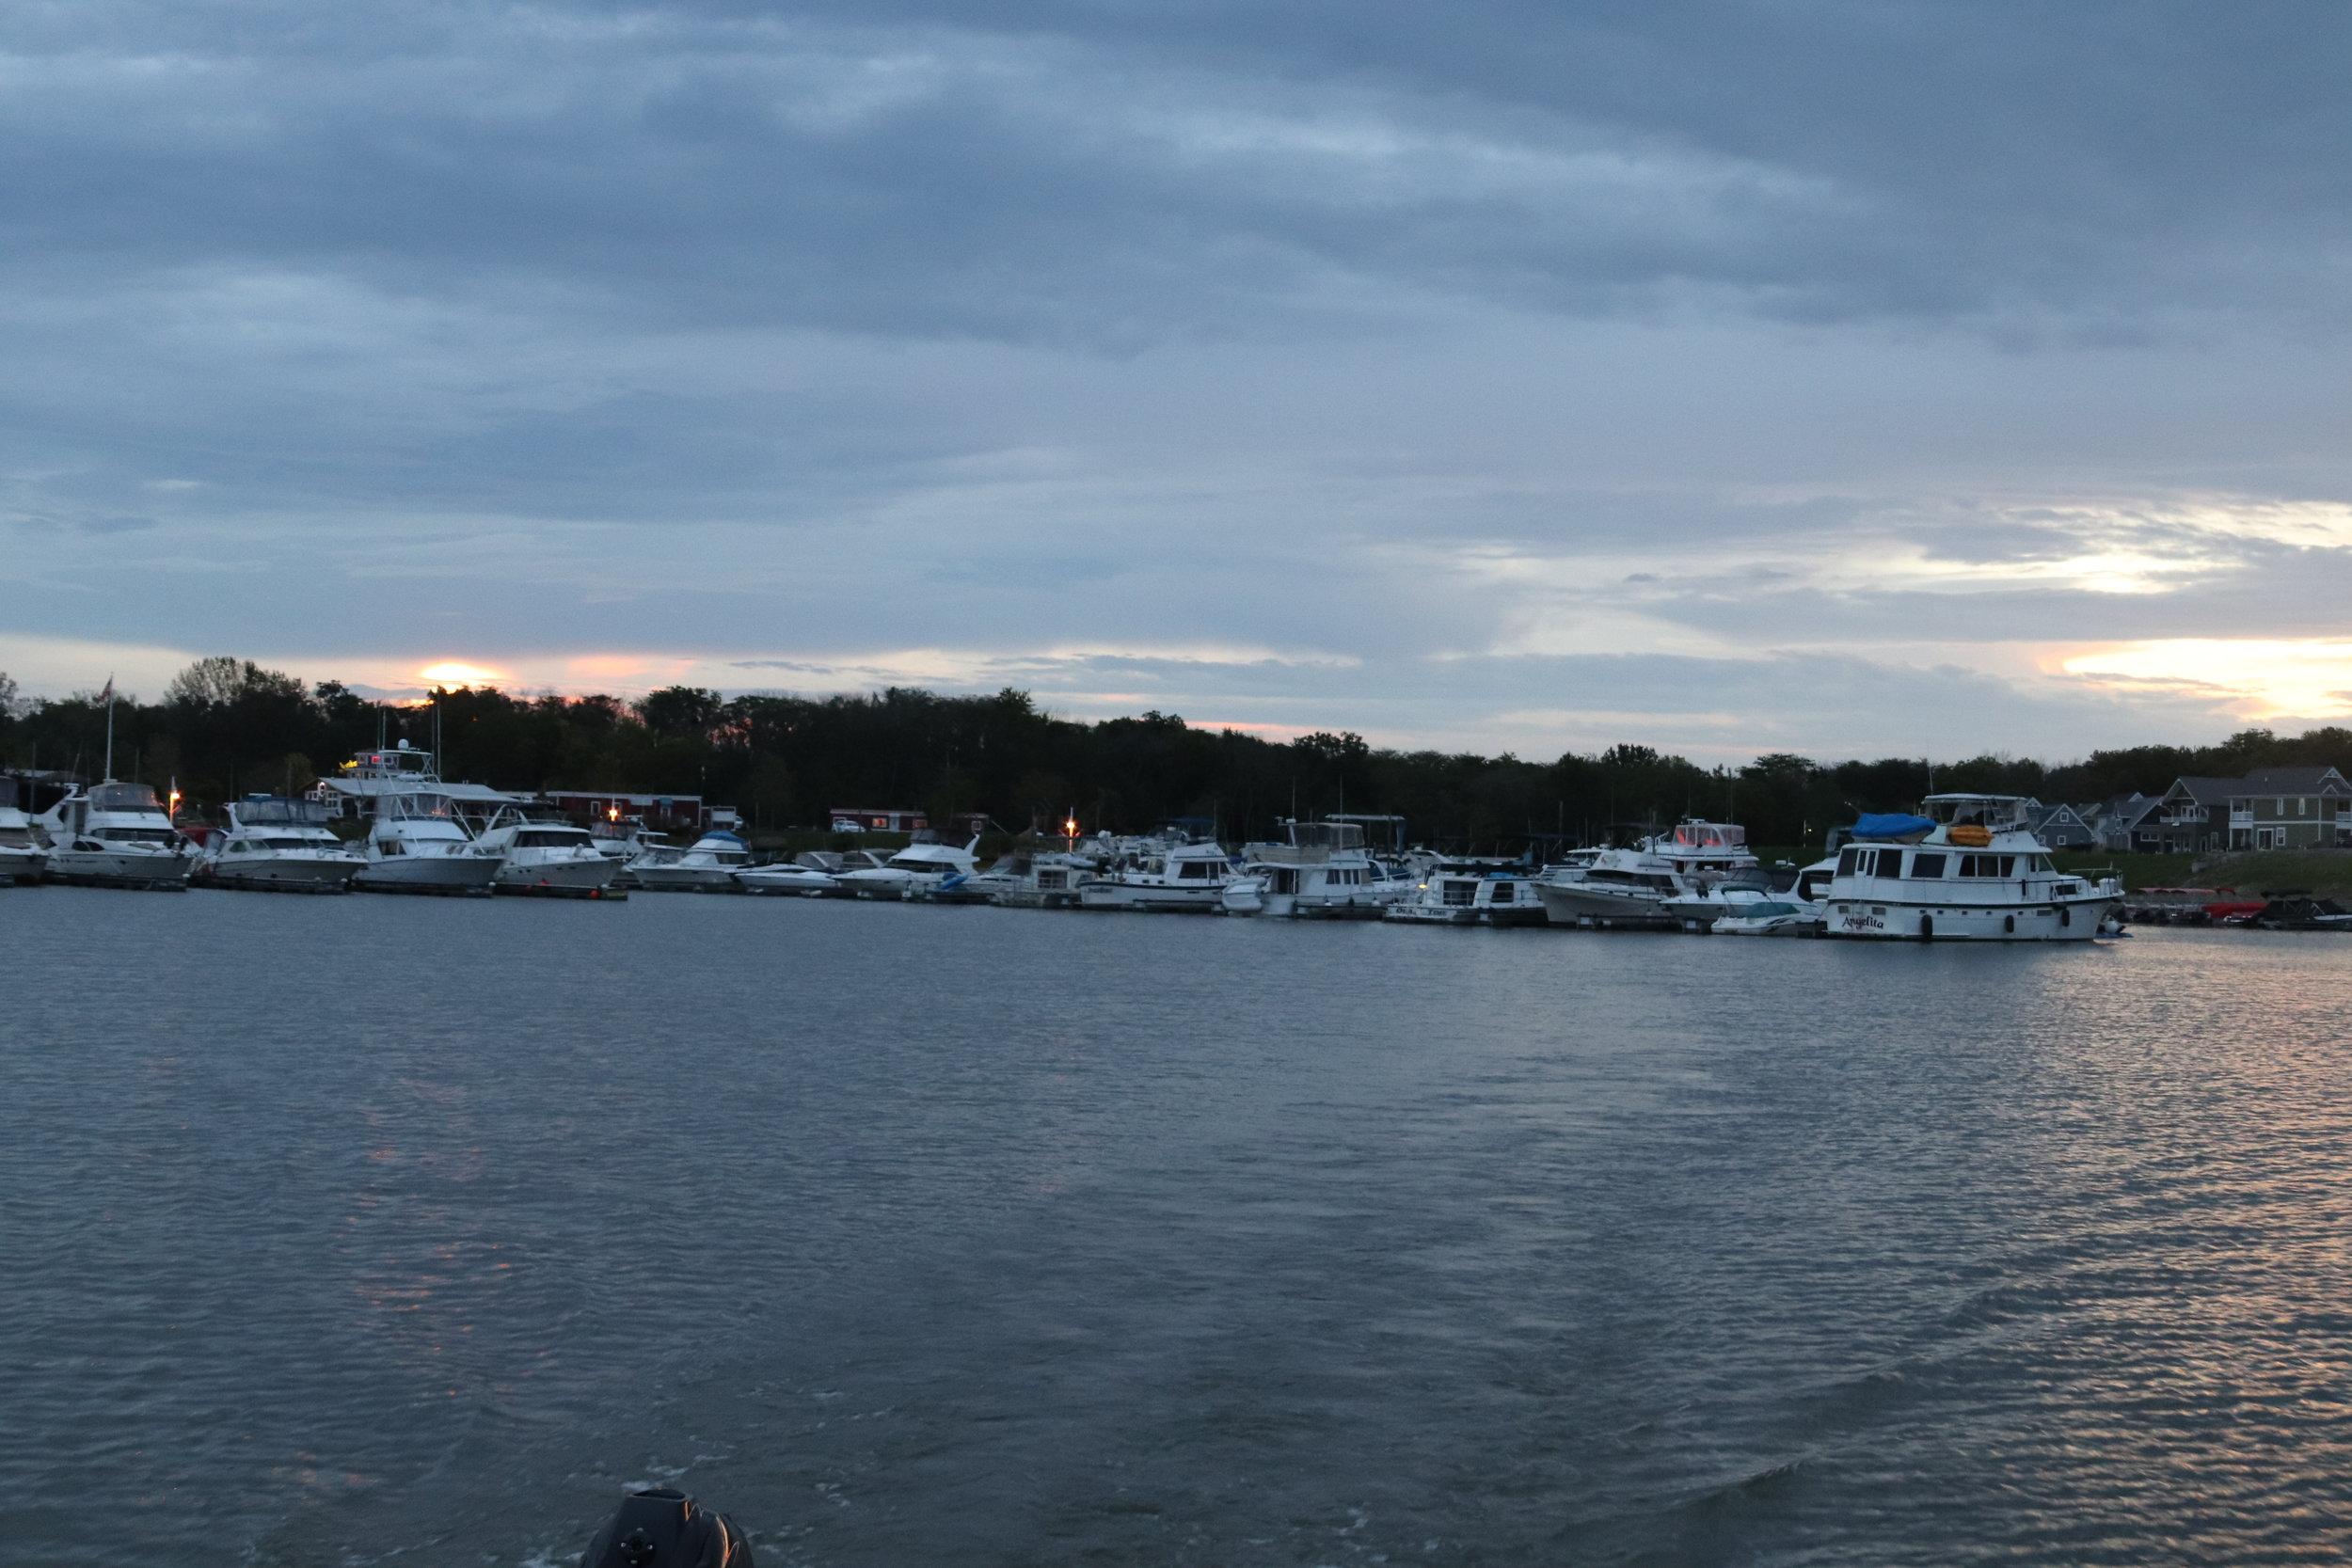 Leaving a marina full of loopers